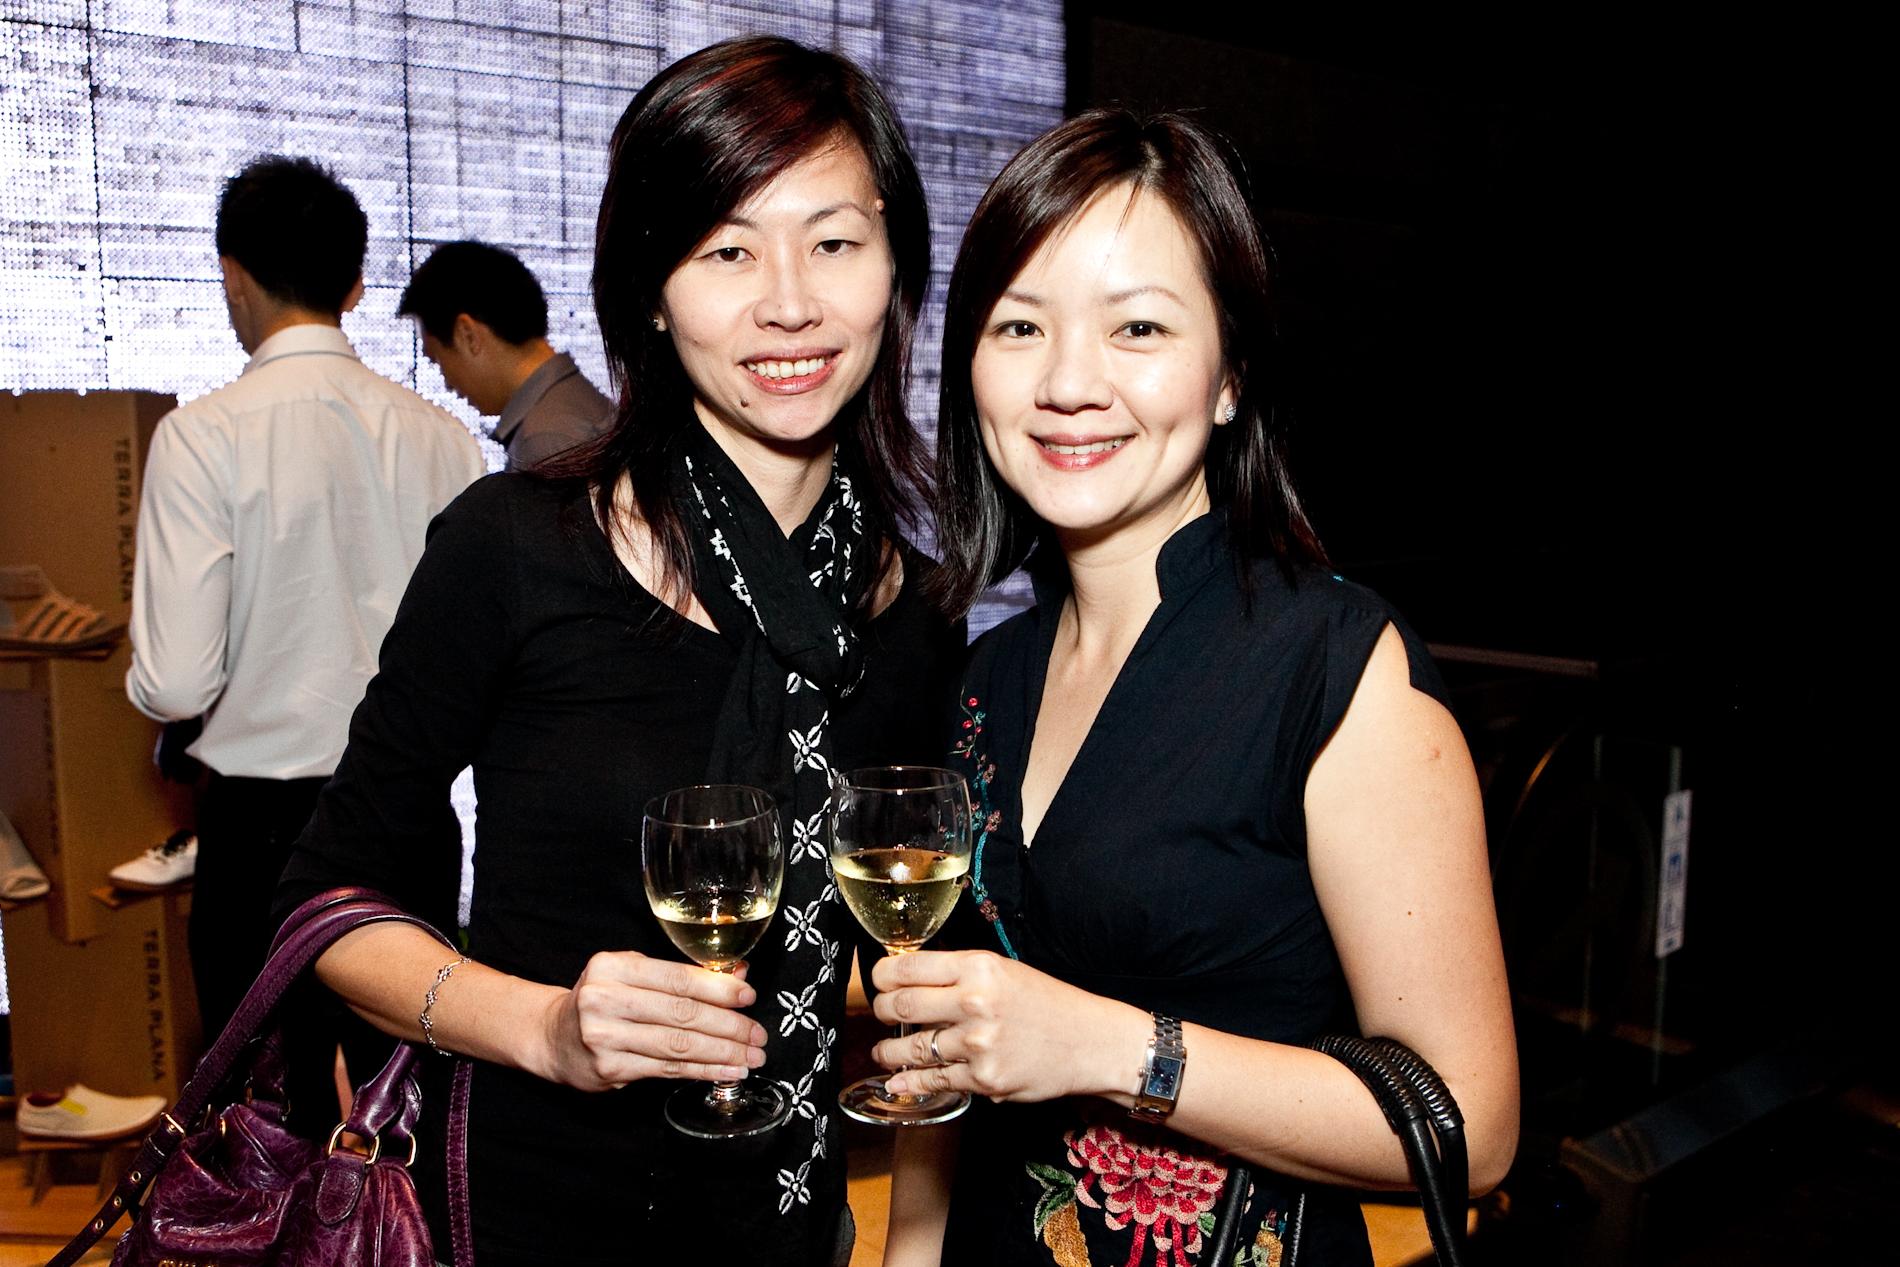 qi-global-2009-sustaible-design-singapore-093.jpg